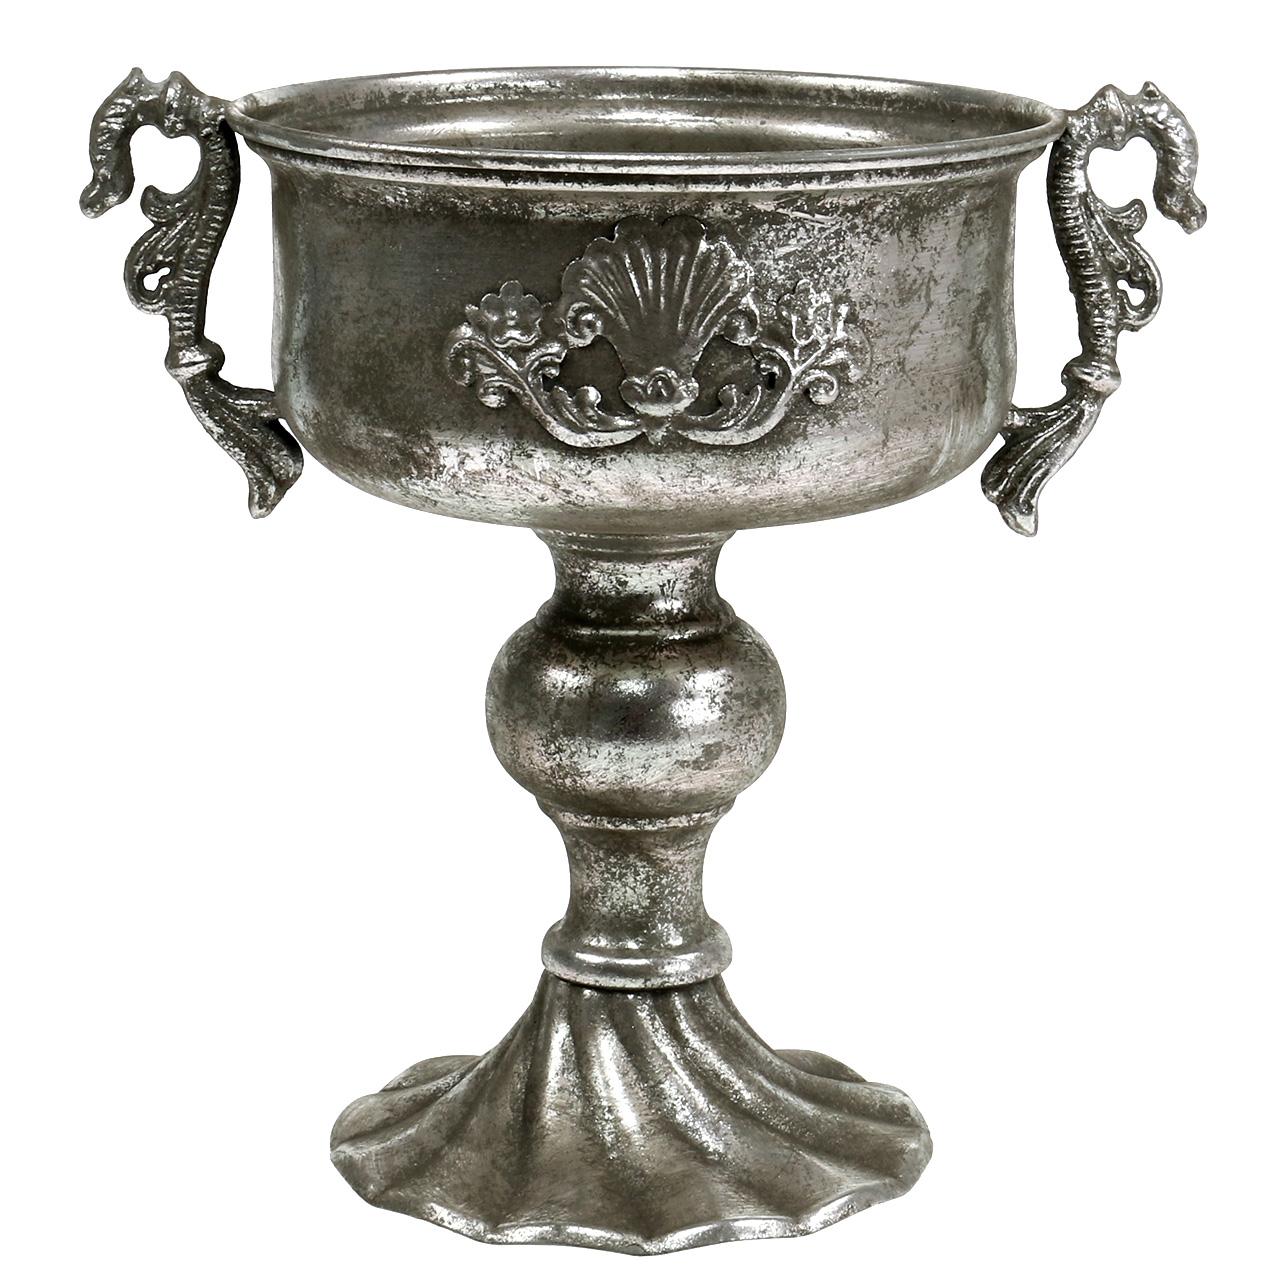 Antik Pokal Aus Metall In Silber U00d818cm H30cm Preiswert